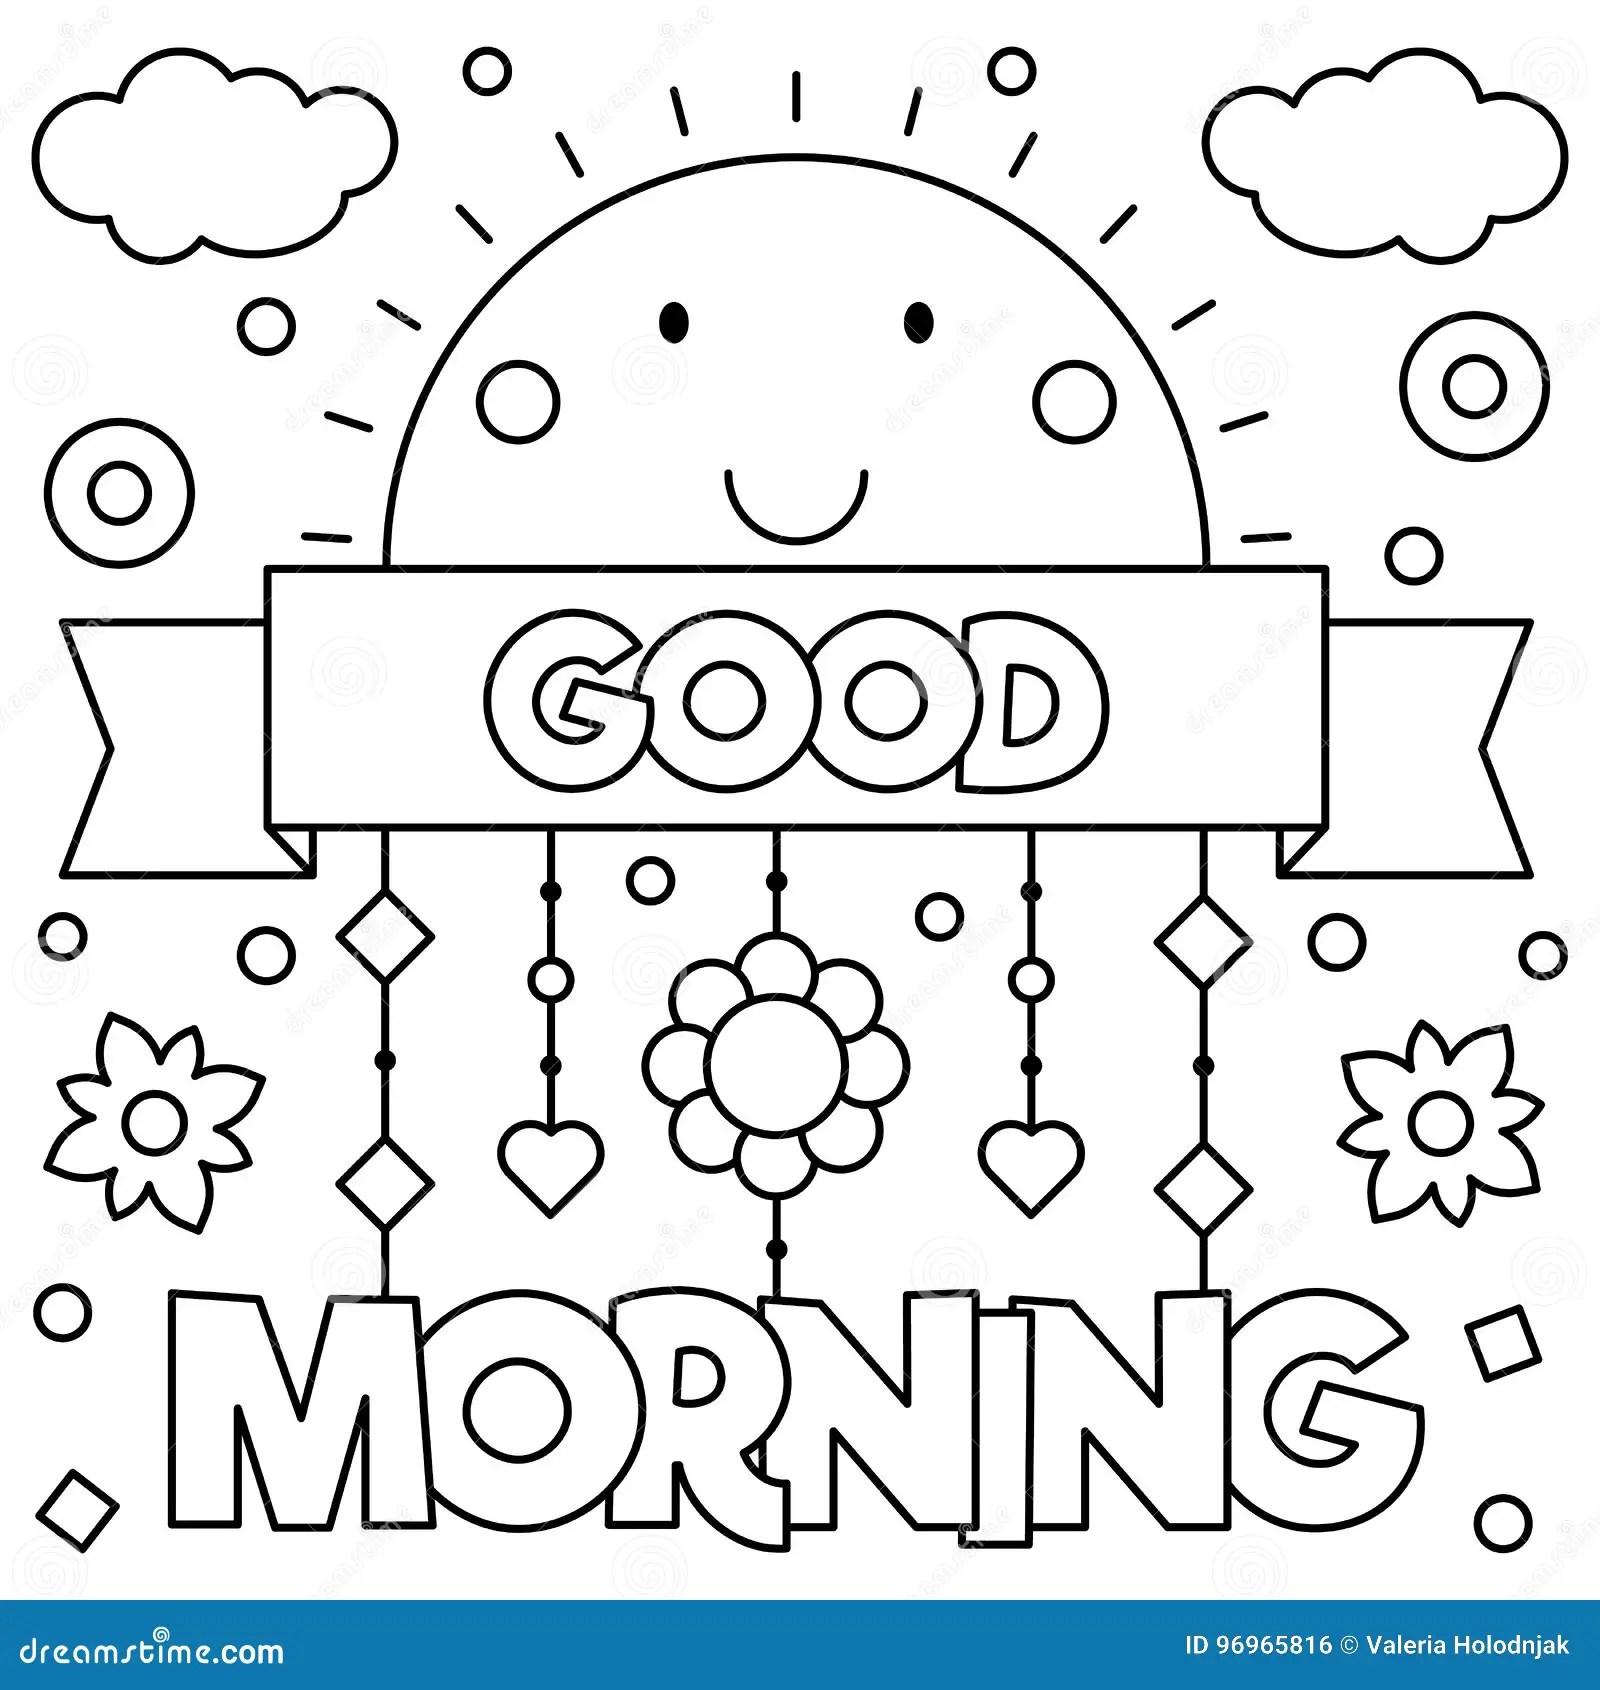 Good Morning Coloring Sheet